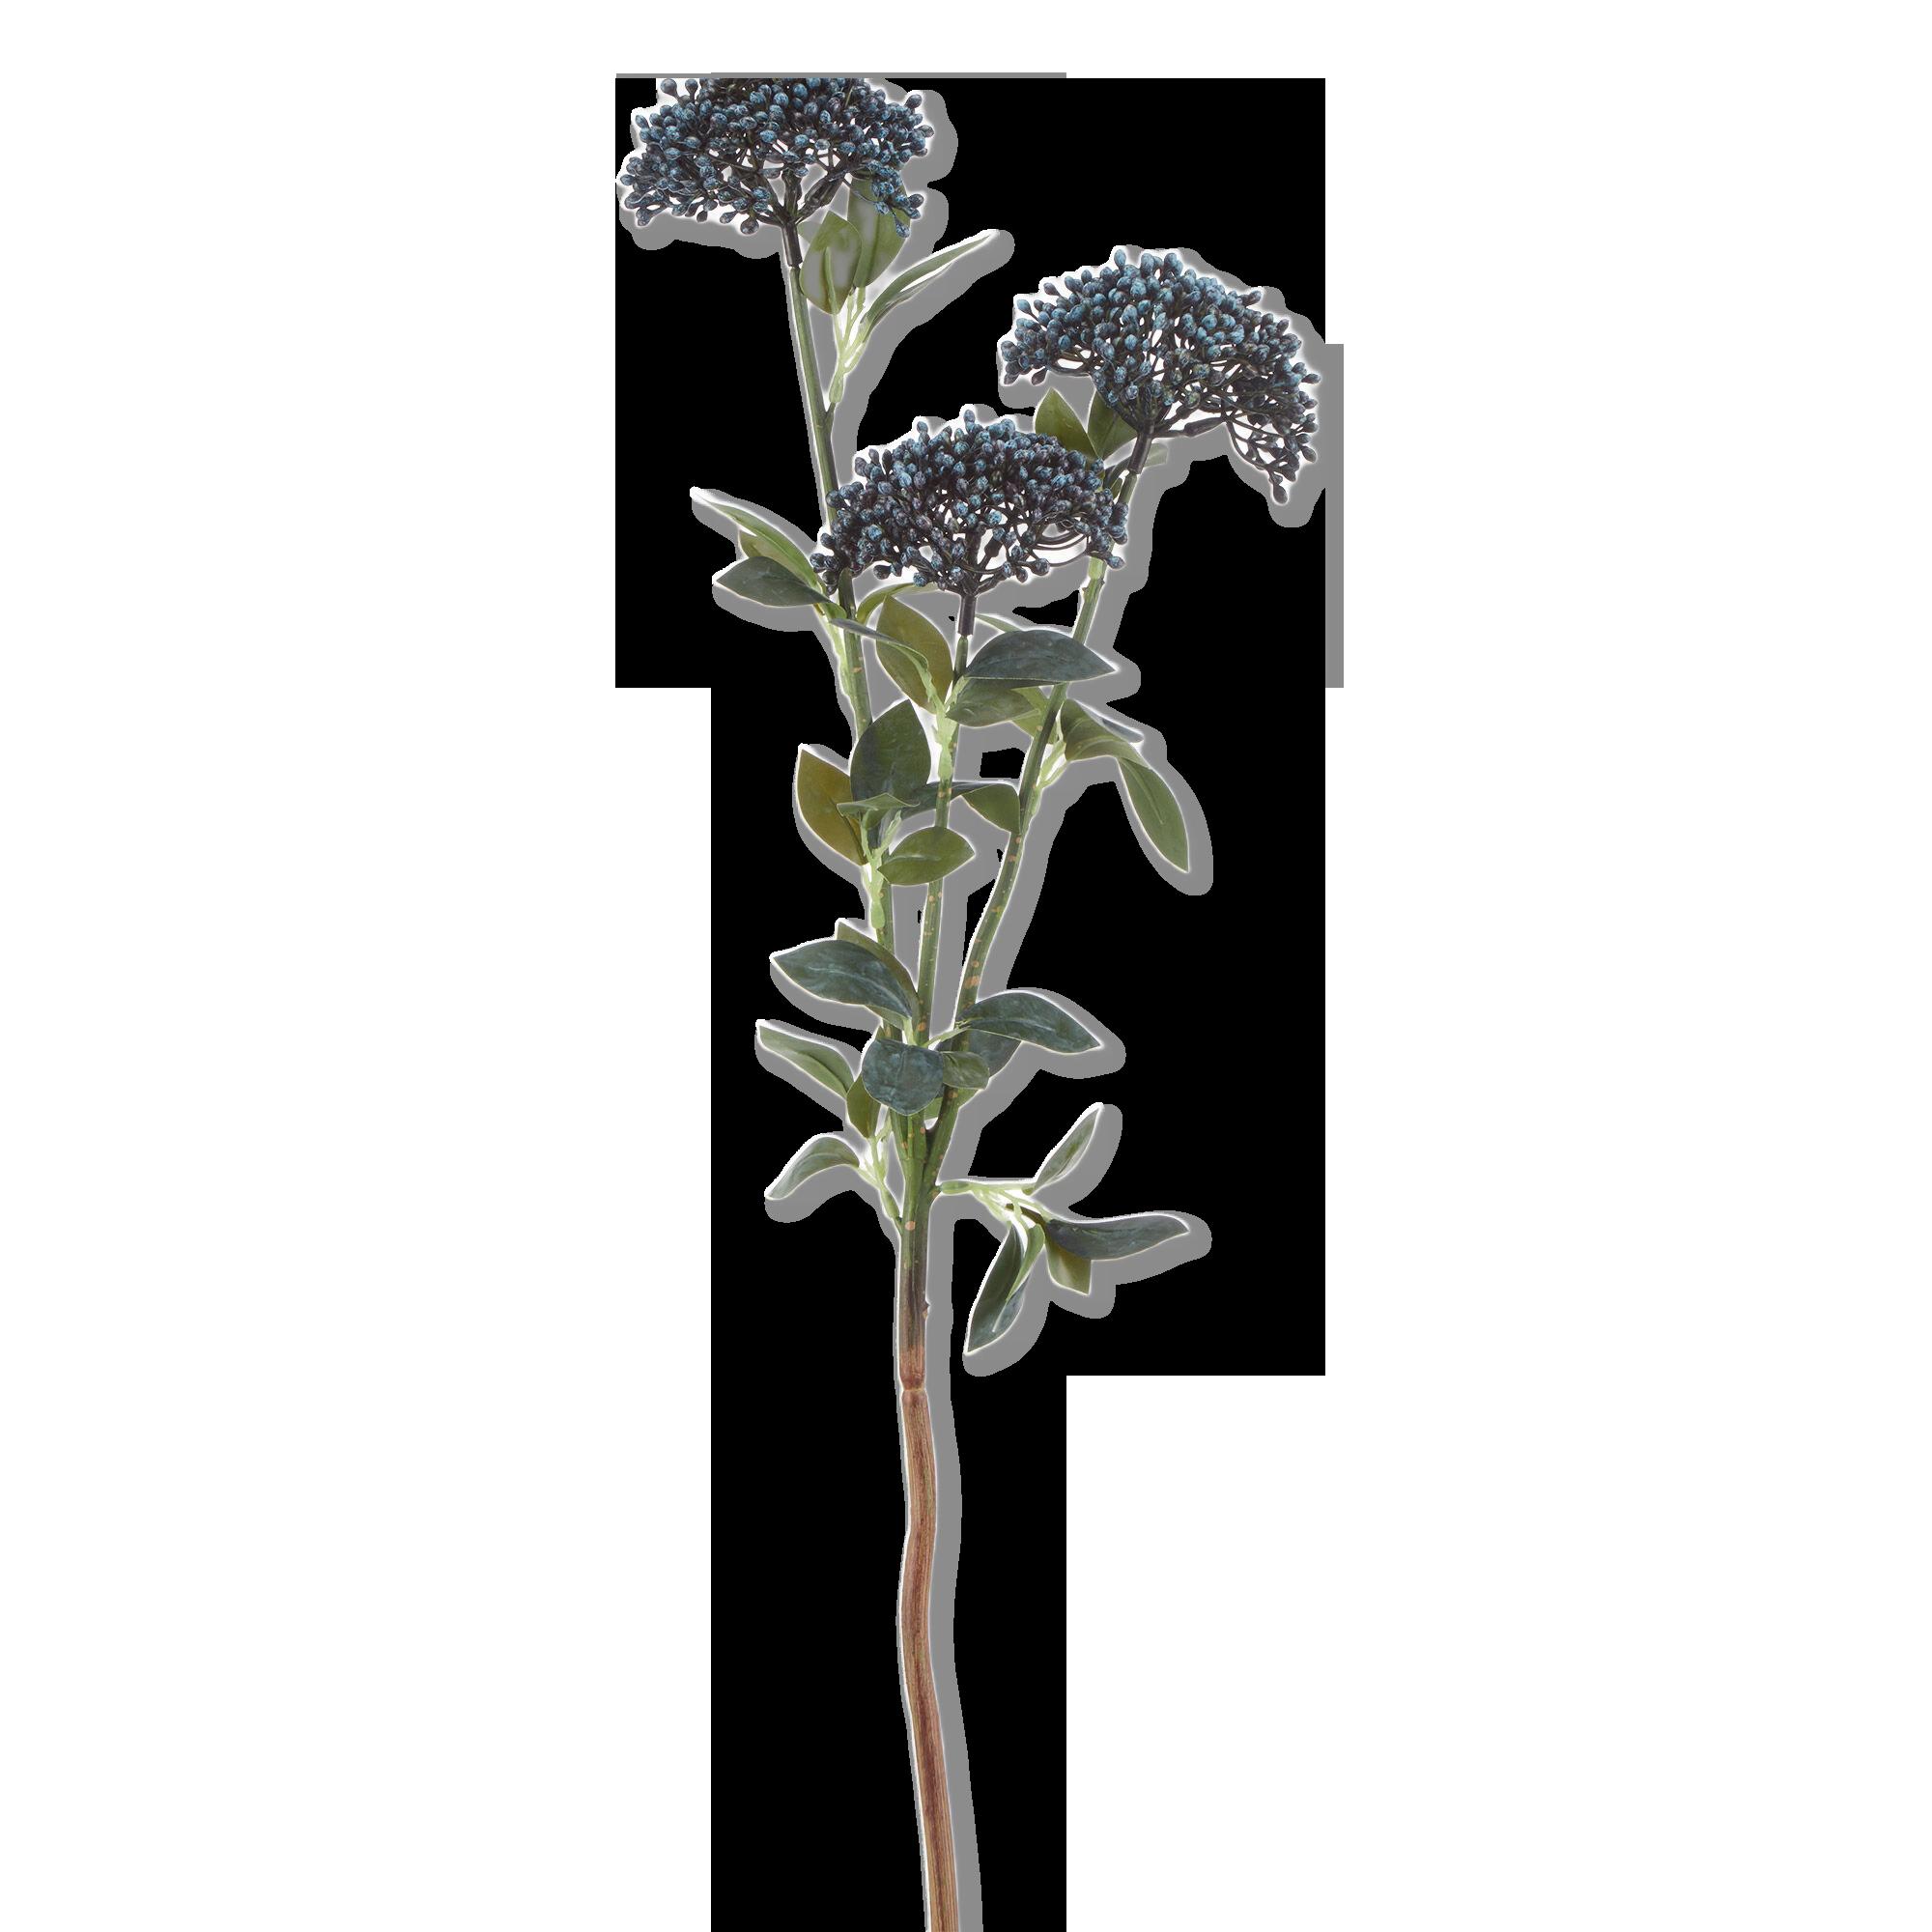 Tige d'hortensia bleue